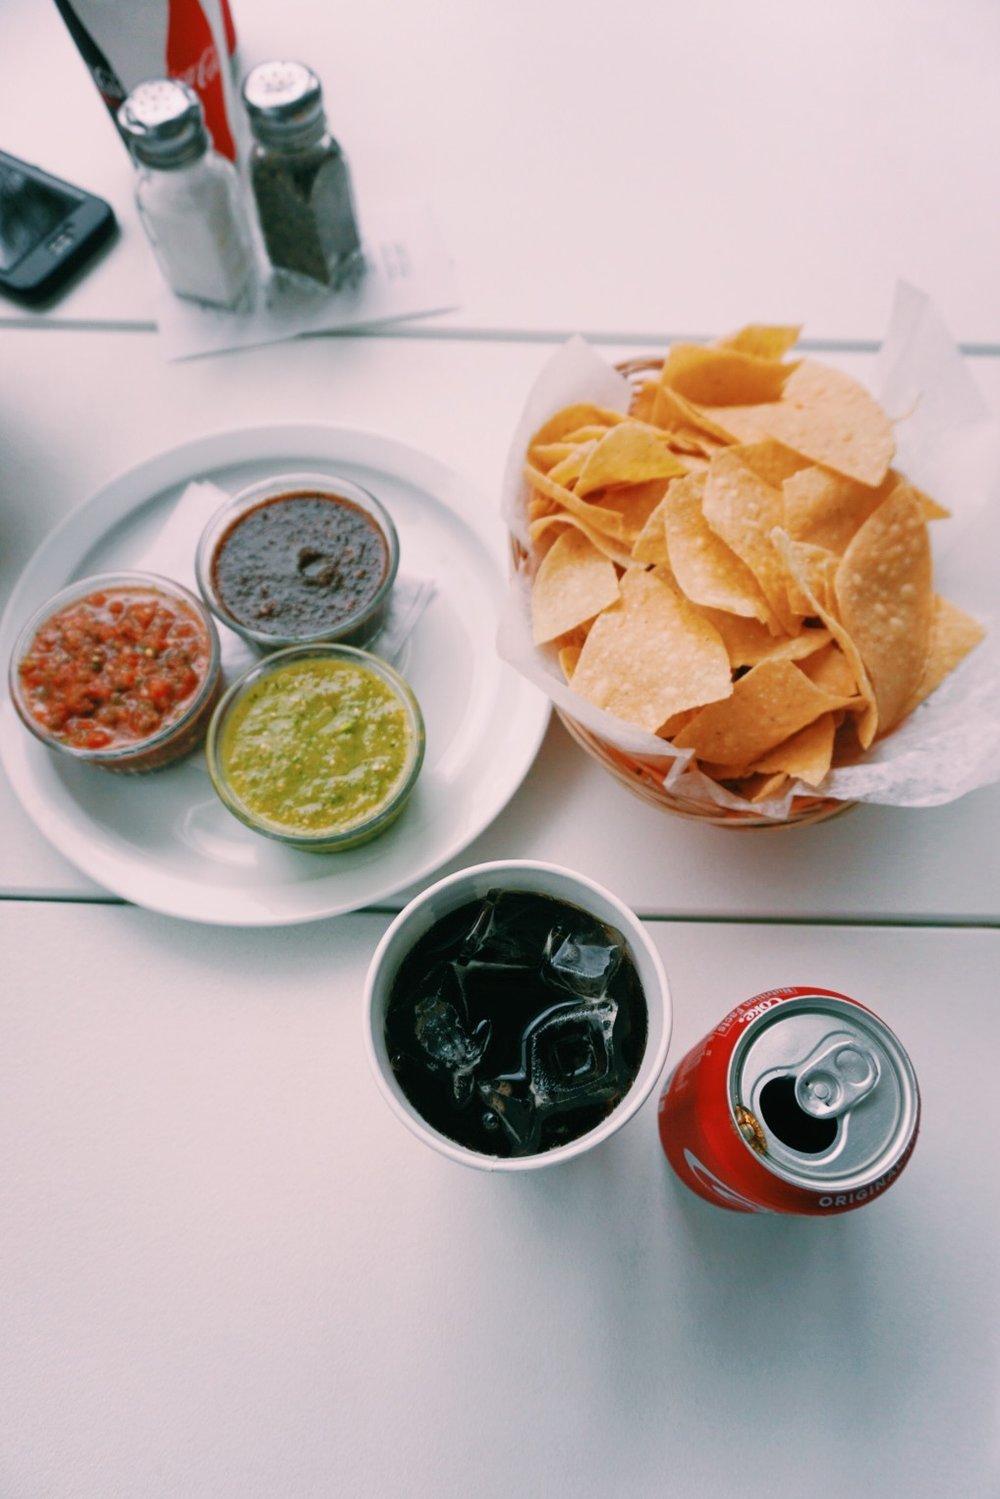 Chips and Salsa Trio at Taquiera del Sol - Athens, GA taco shop